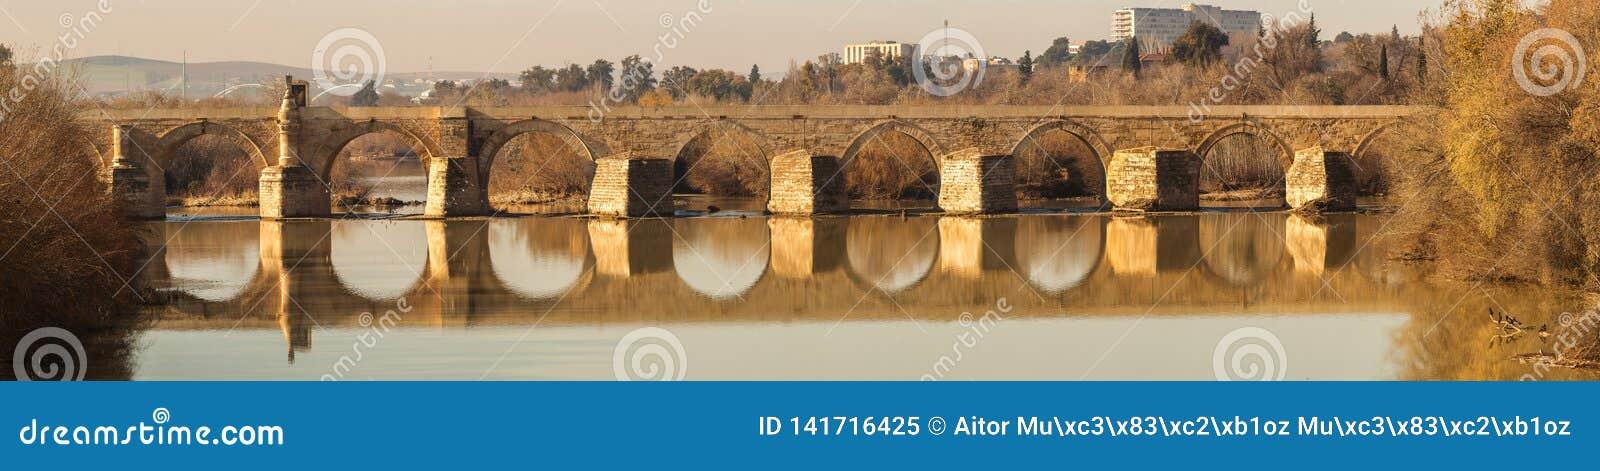 Old stone Roman bridge across Guadalquivir river in sunlight in Cordoba, Spain